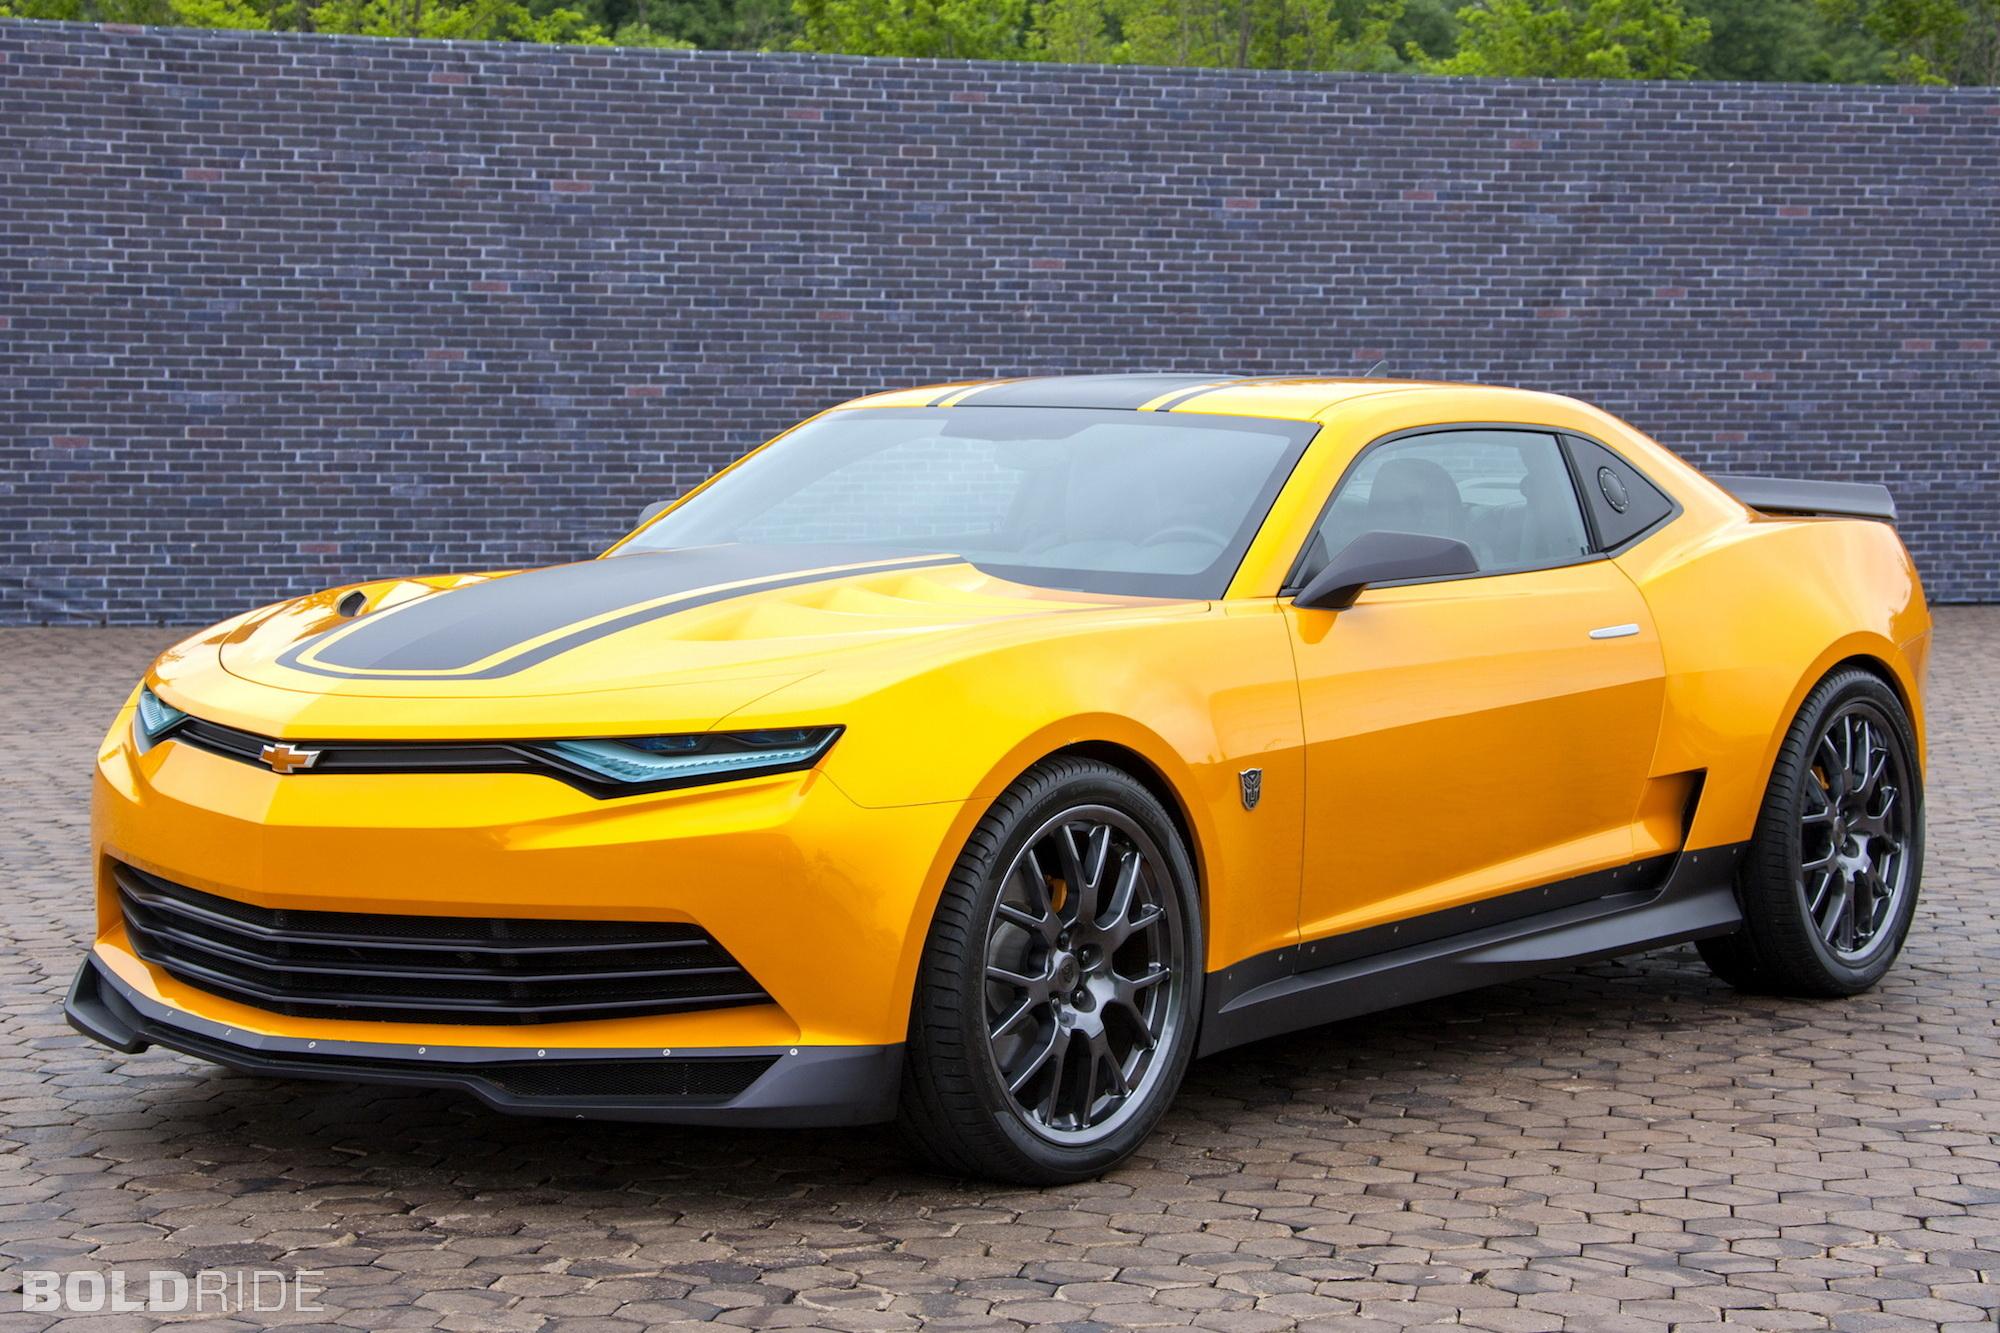 Spy Photos 2014 Transformers Bumblebee Camaro  New